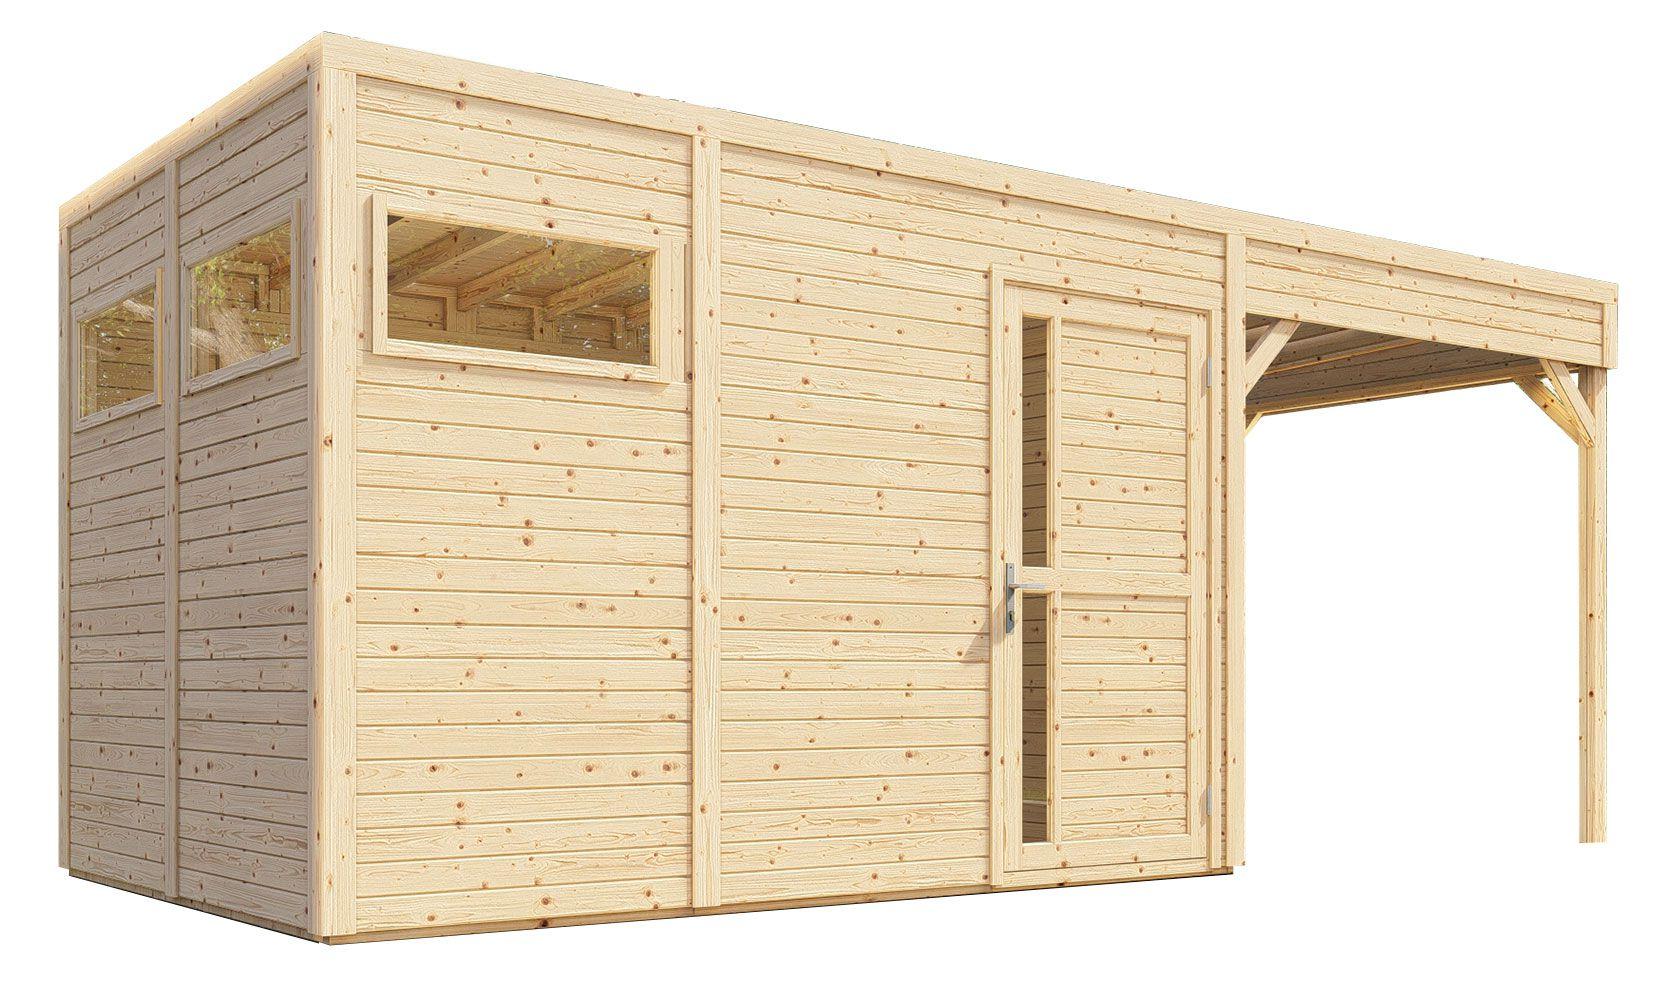 Gartenhaus Basel 03 mit Anbaudach inkl. Fußboden und Dachpappe, Naturbelassen - 19 mm Elementgartenhaus, Nutzfläche: 7,70 m², Flachdach